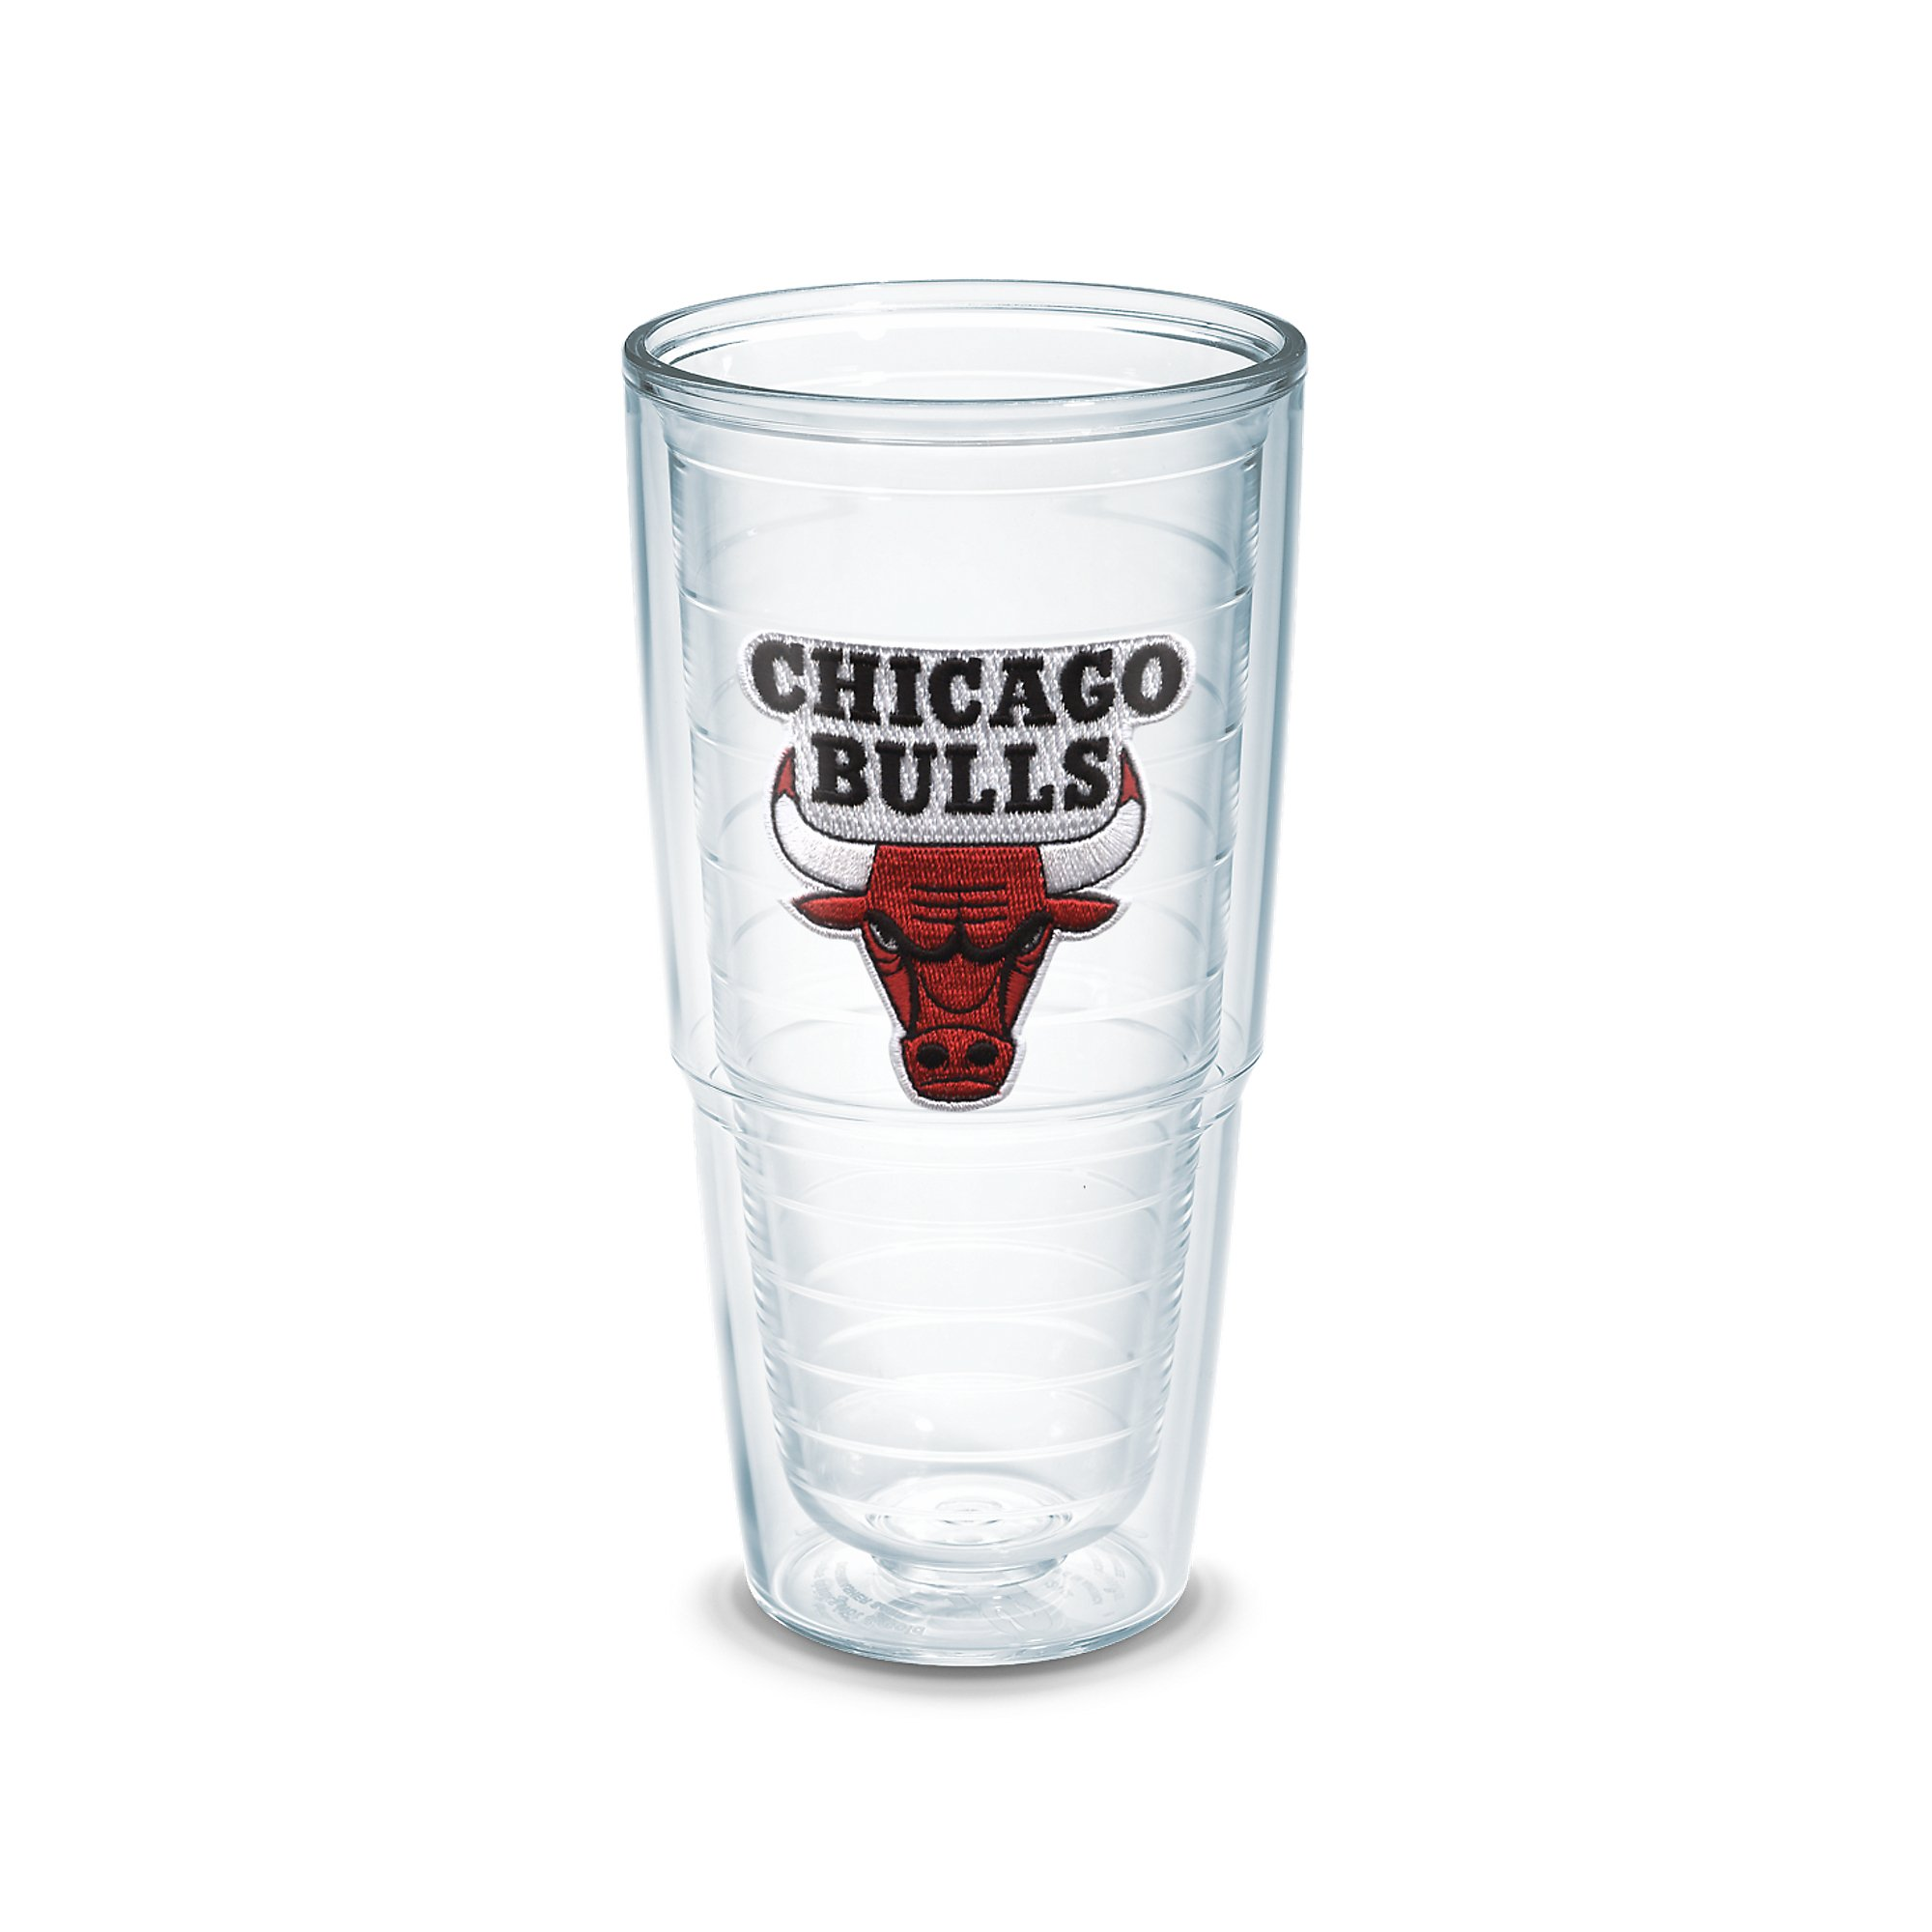 Tervis 1051528''NBA Chicago Bulls'' Tumbler, Emblem, 24 oz, Clear